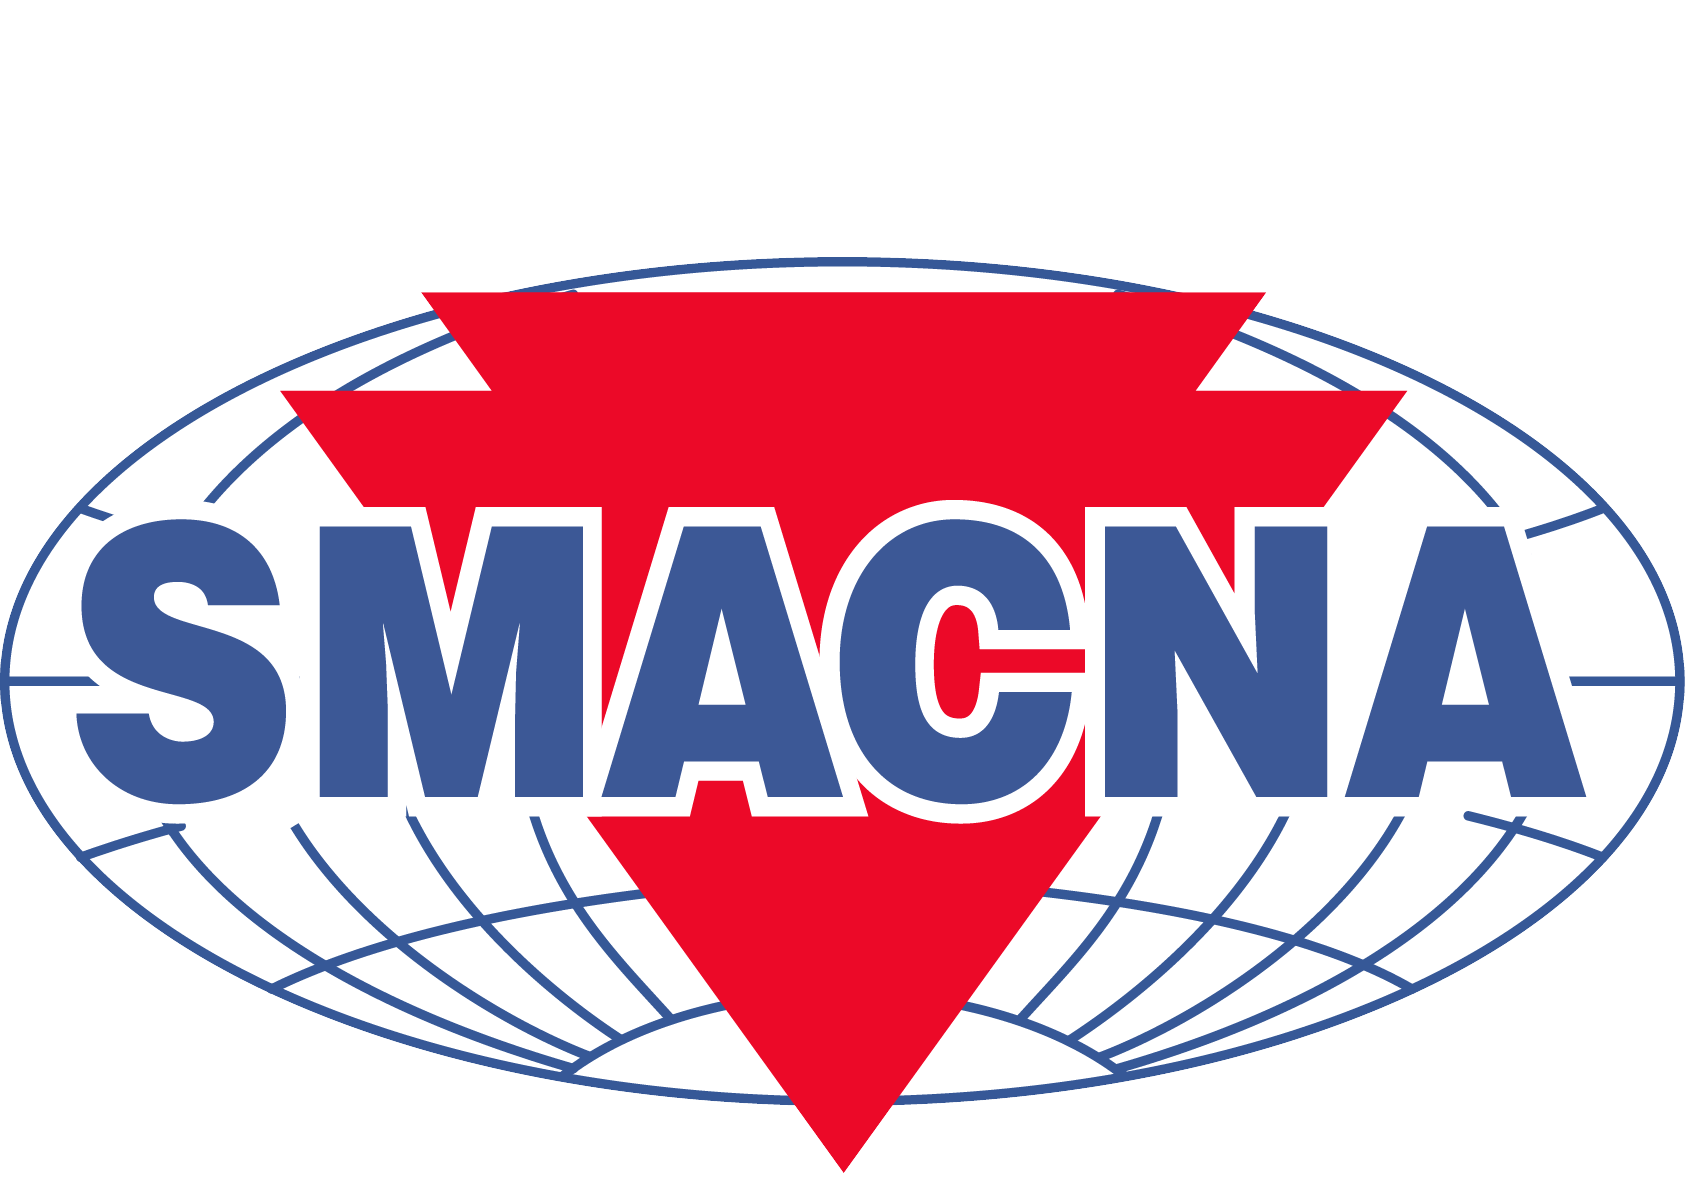 SMACNA-NoCity-WhiteBG.png